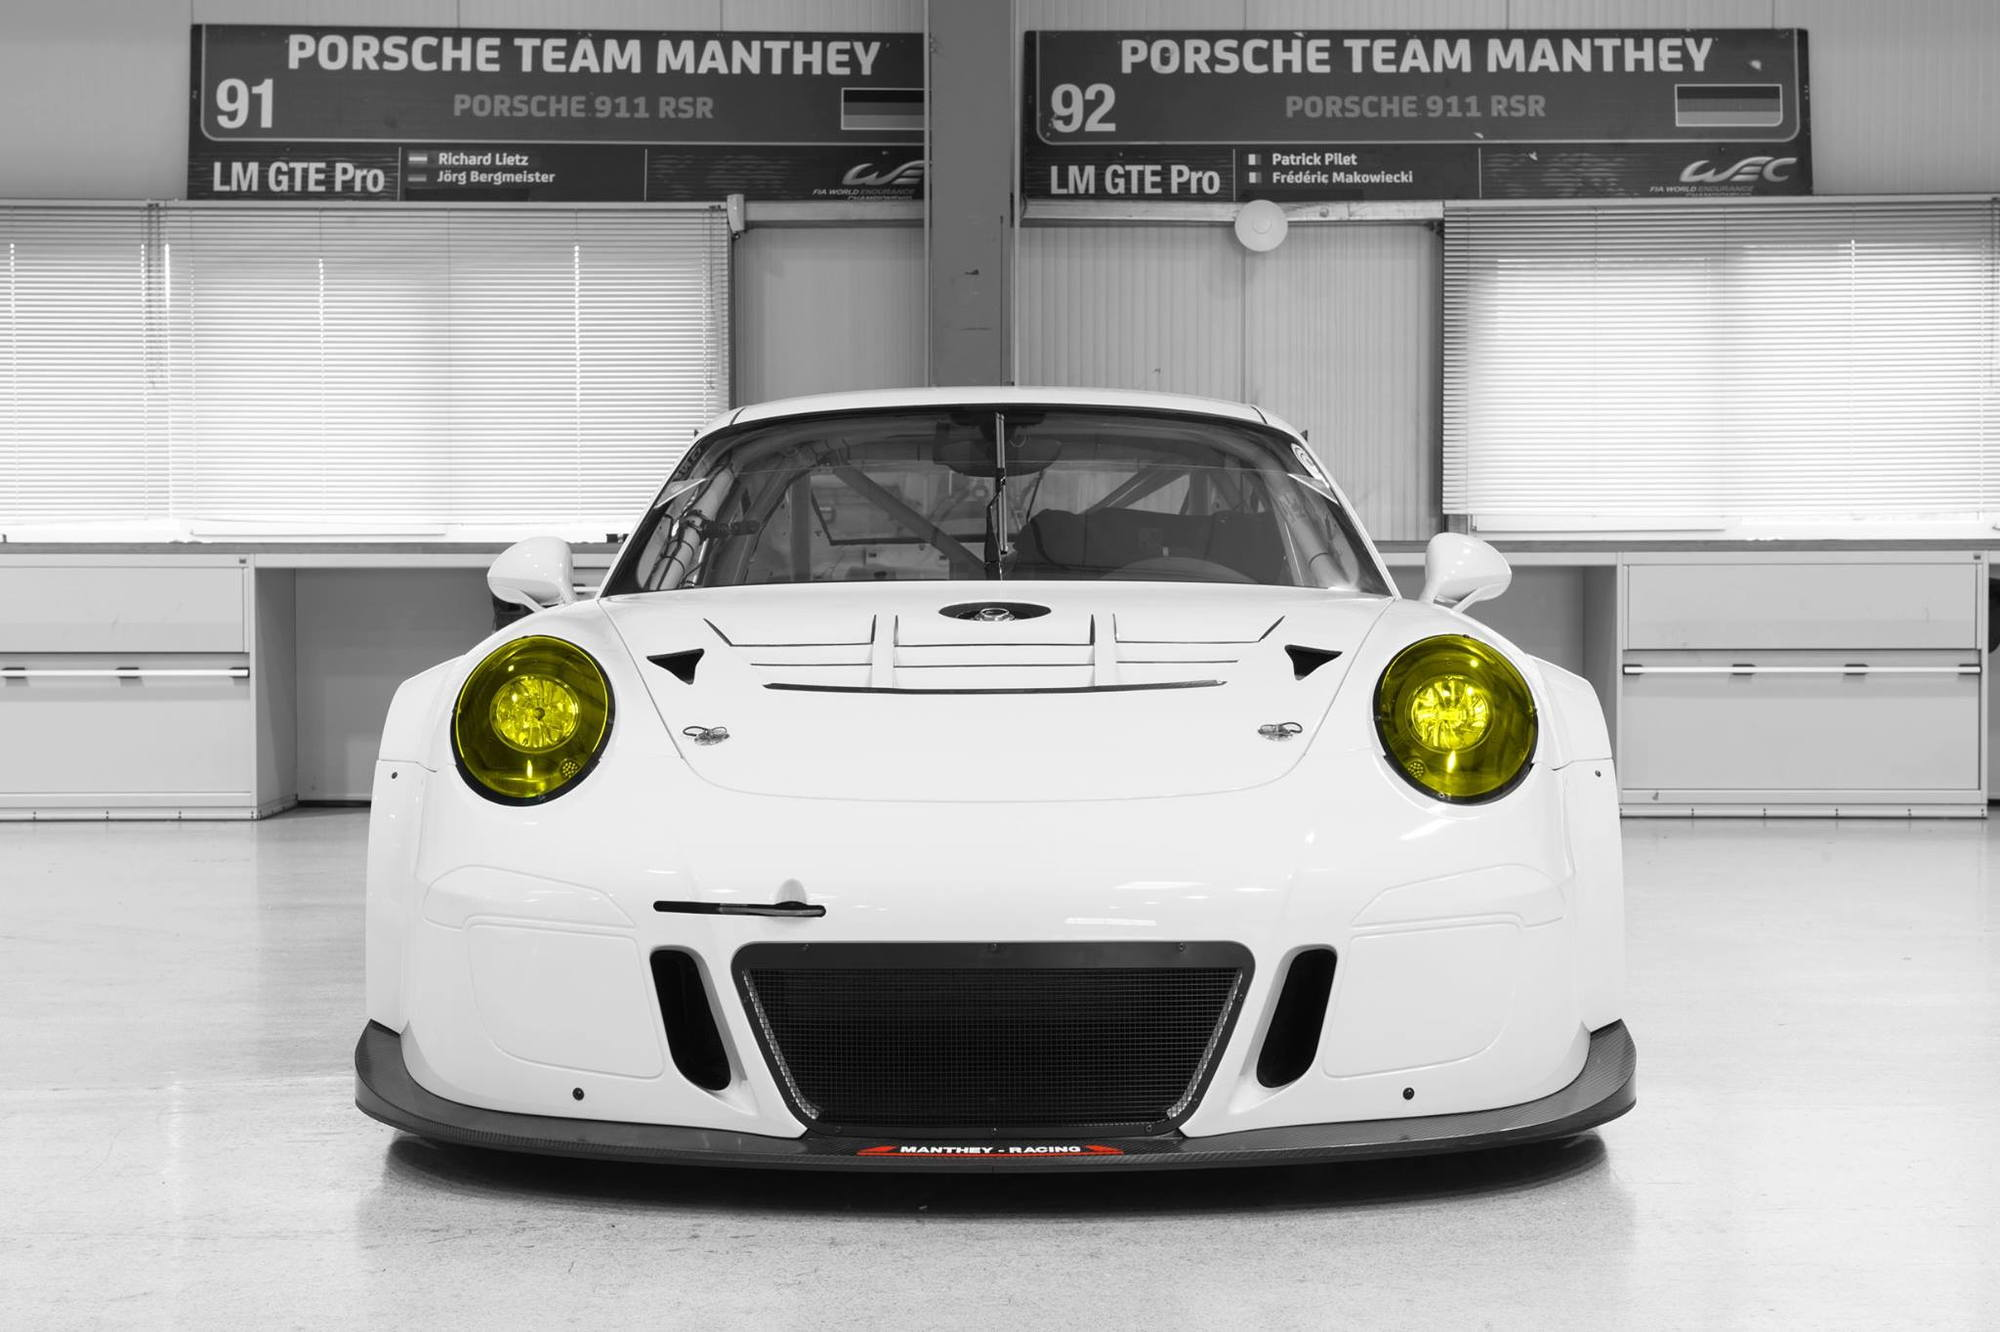 Manthey racing mr cup kit available thru ka motorsport for Porsche ka che